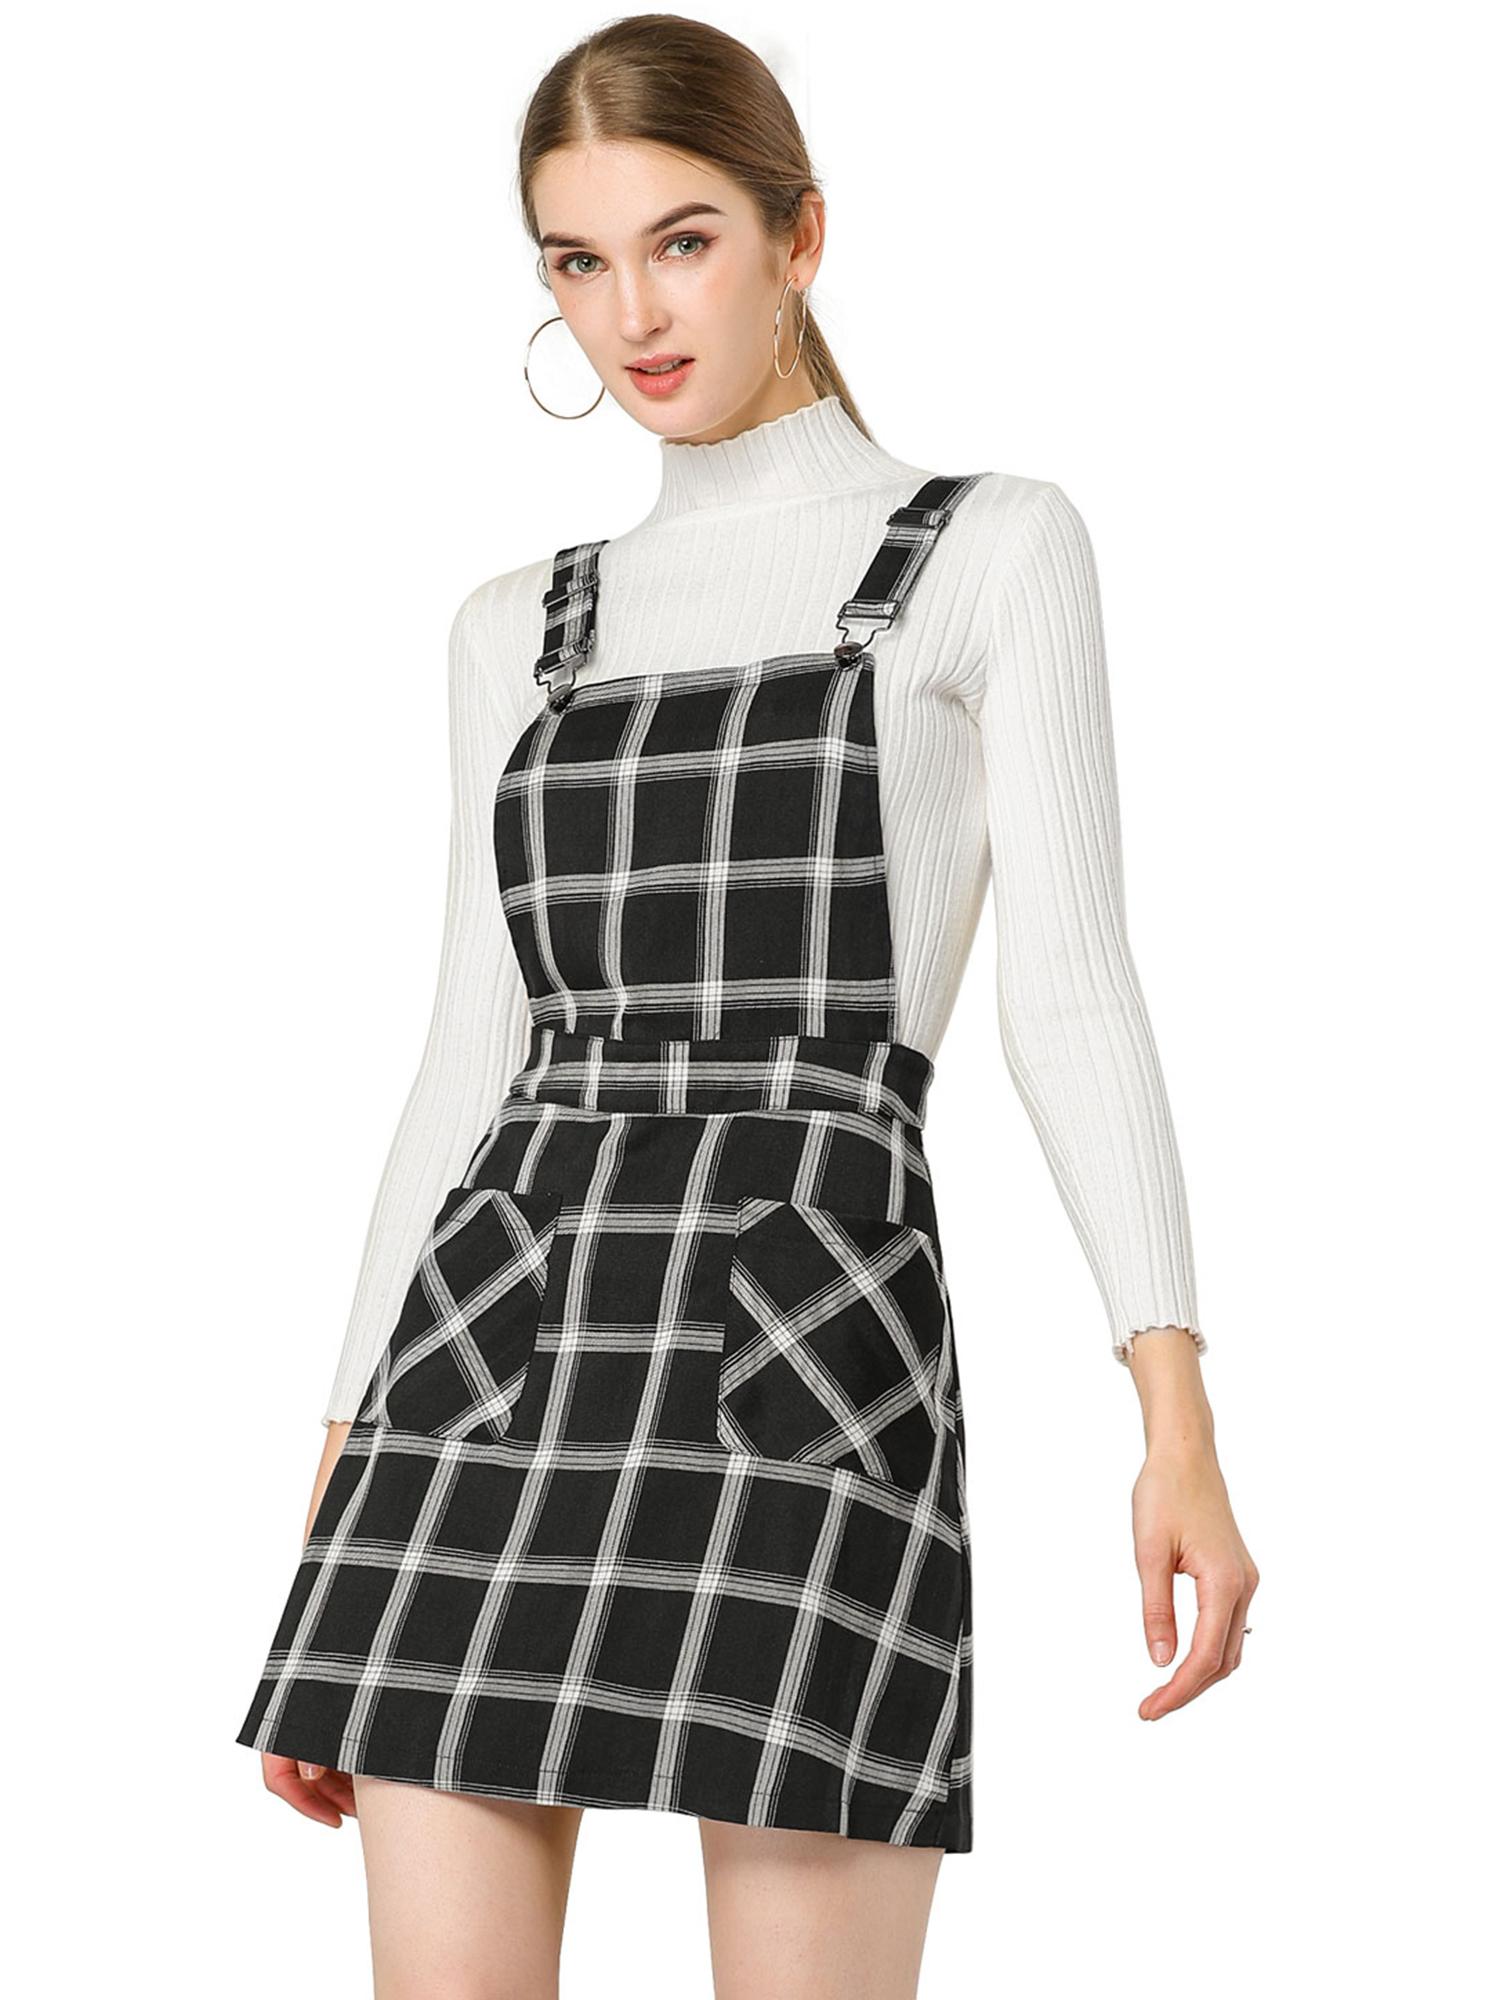 Women's Plaids Adjustable Strap Knee Suspender Dress Black-White L (US 14)